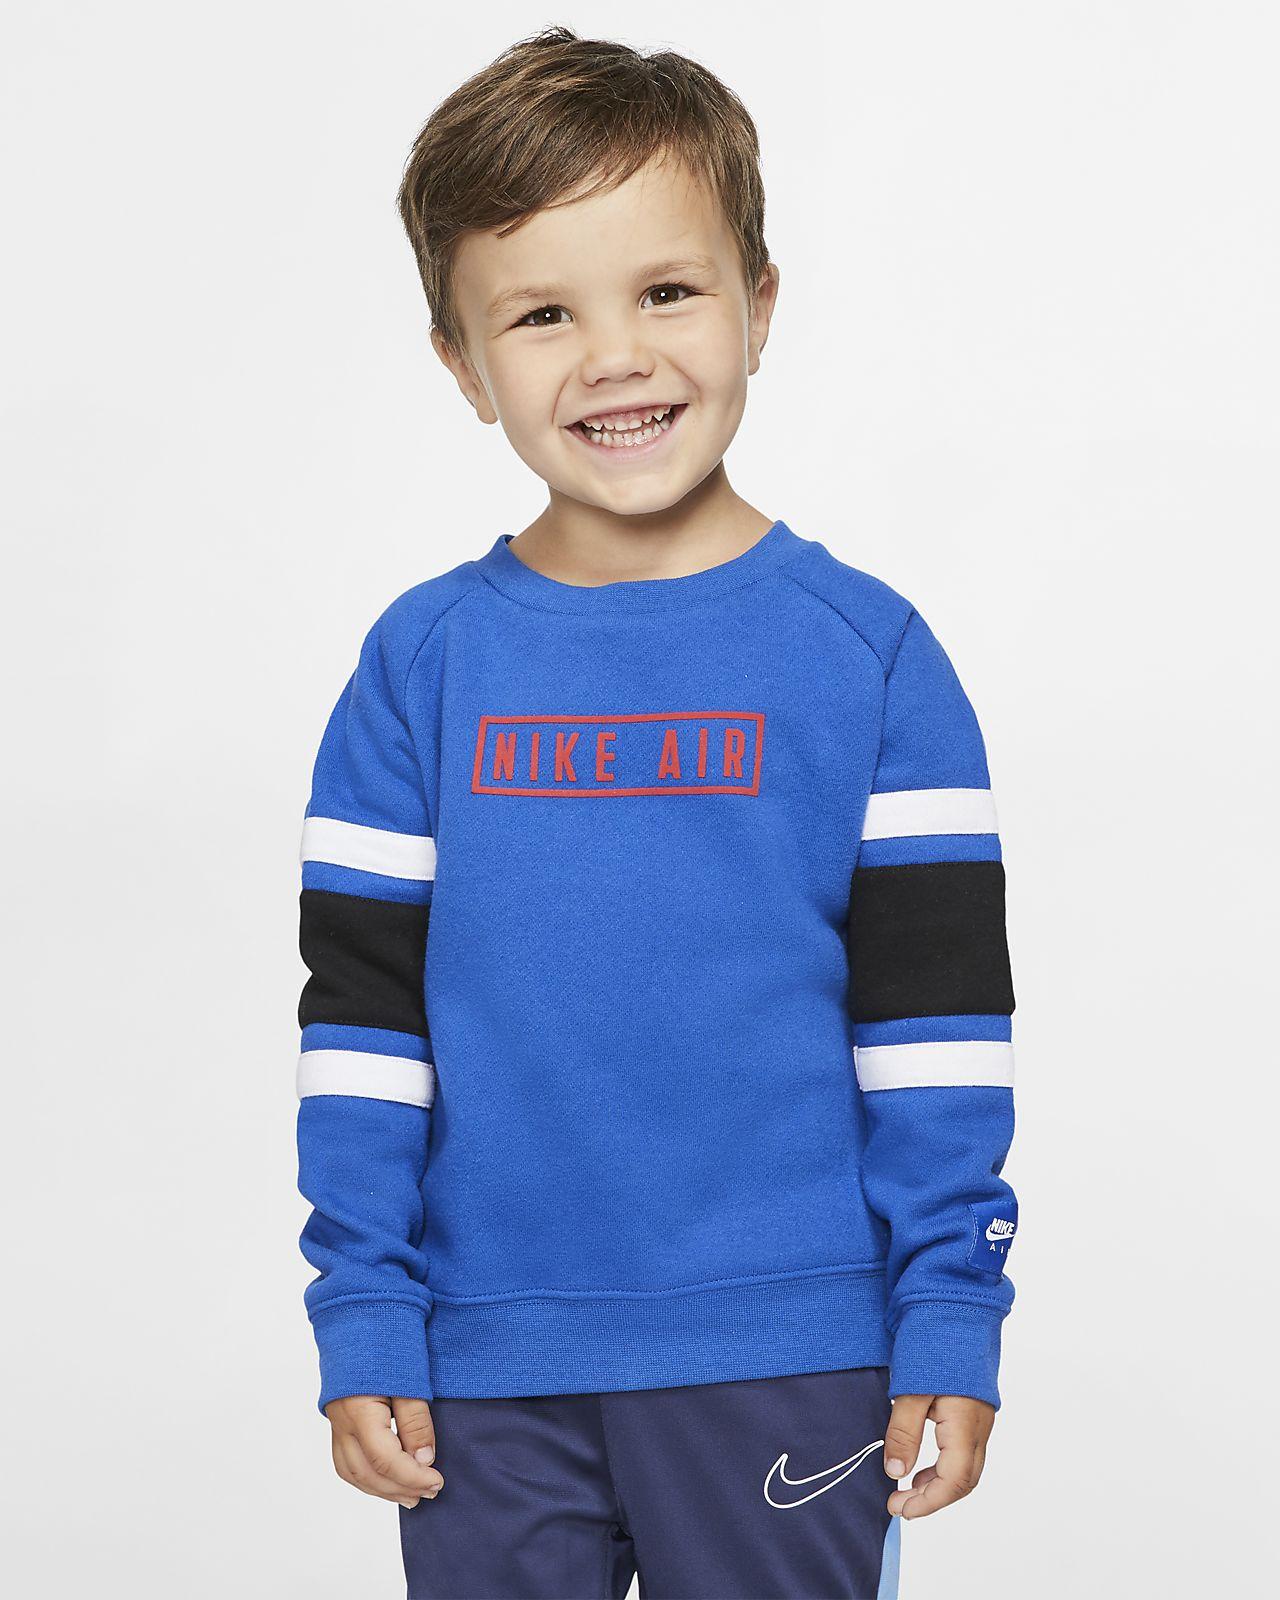 Nike Air Color-Blocked 婴童圆领上衣